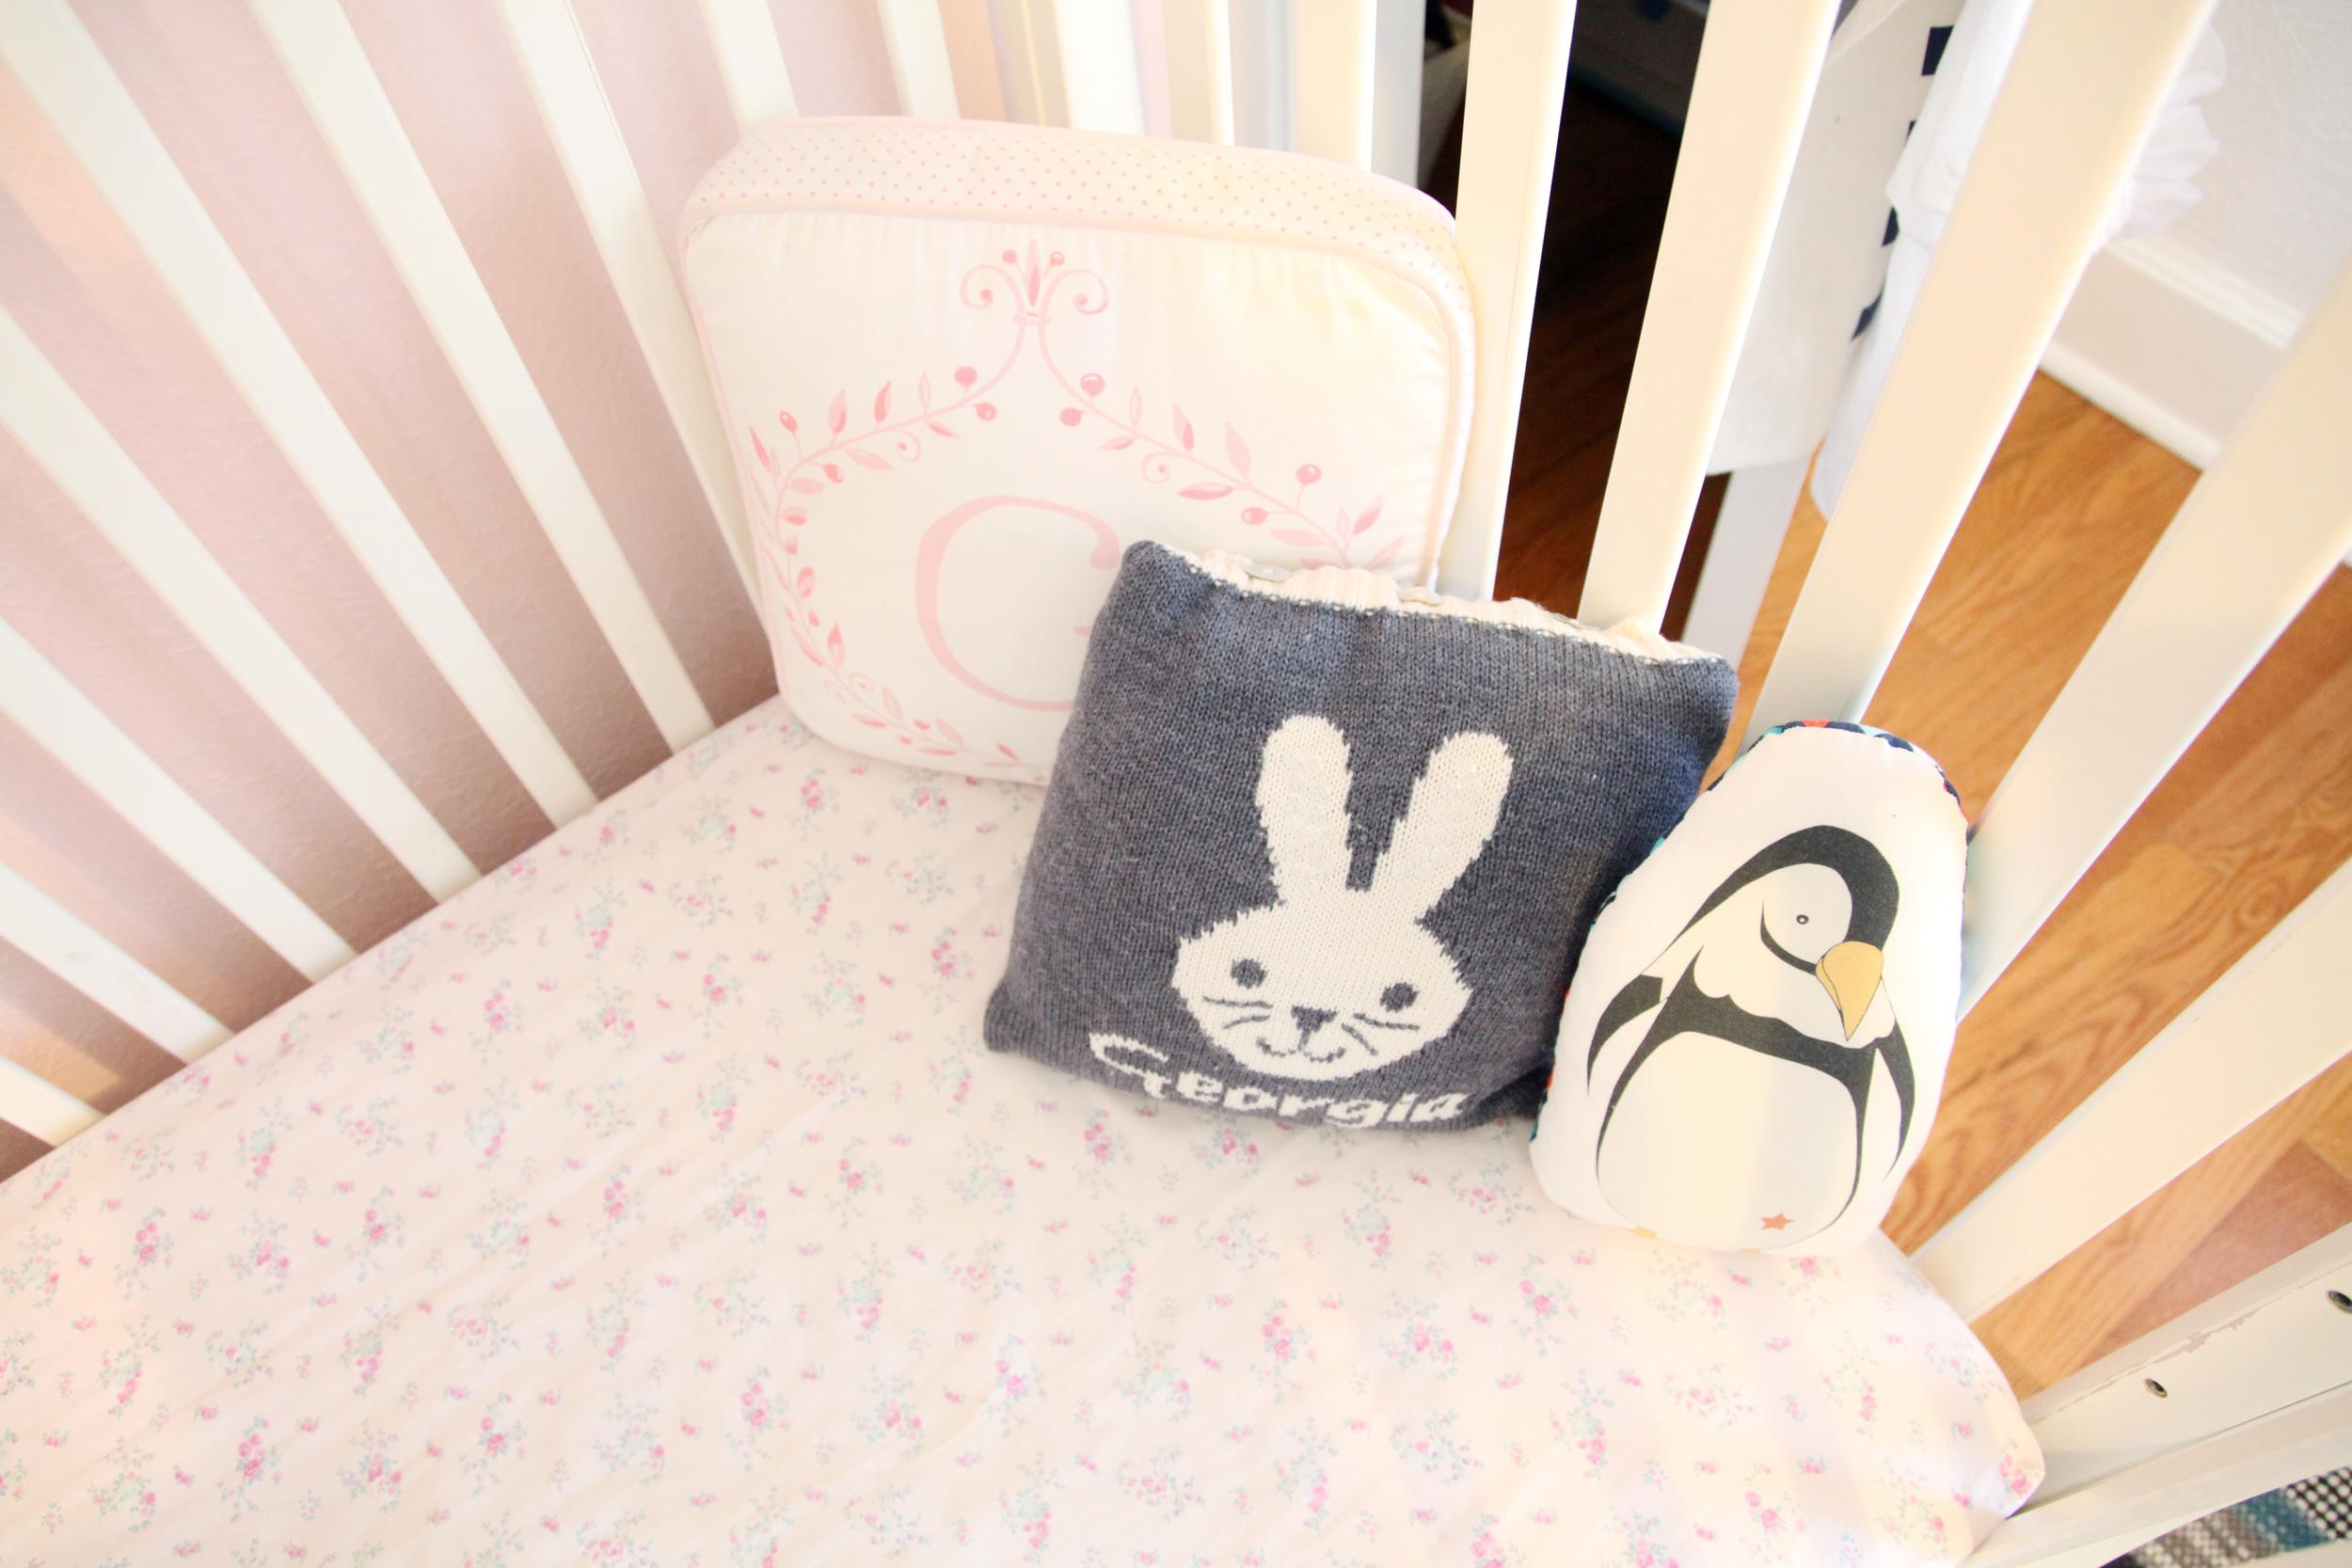 Pile of pillows in Georgia's crib.